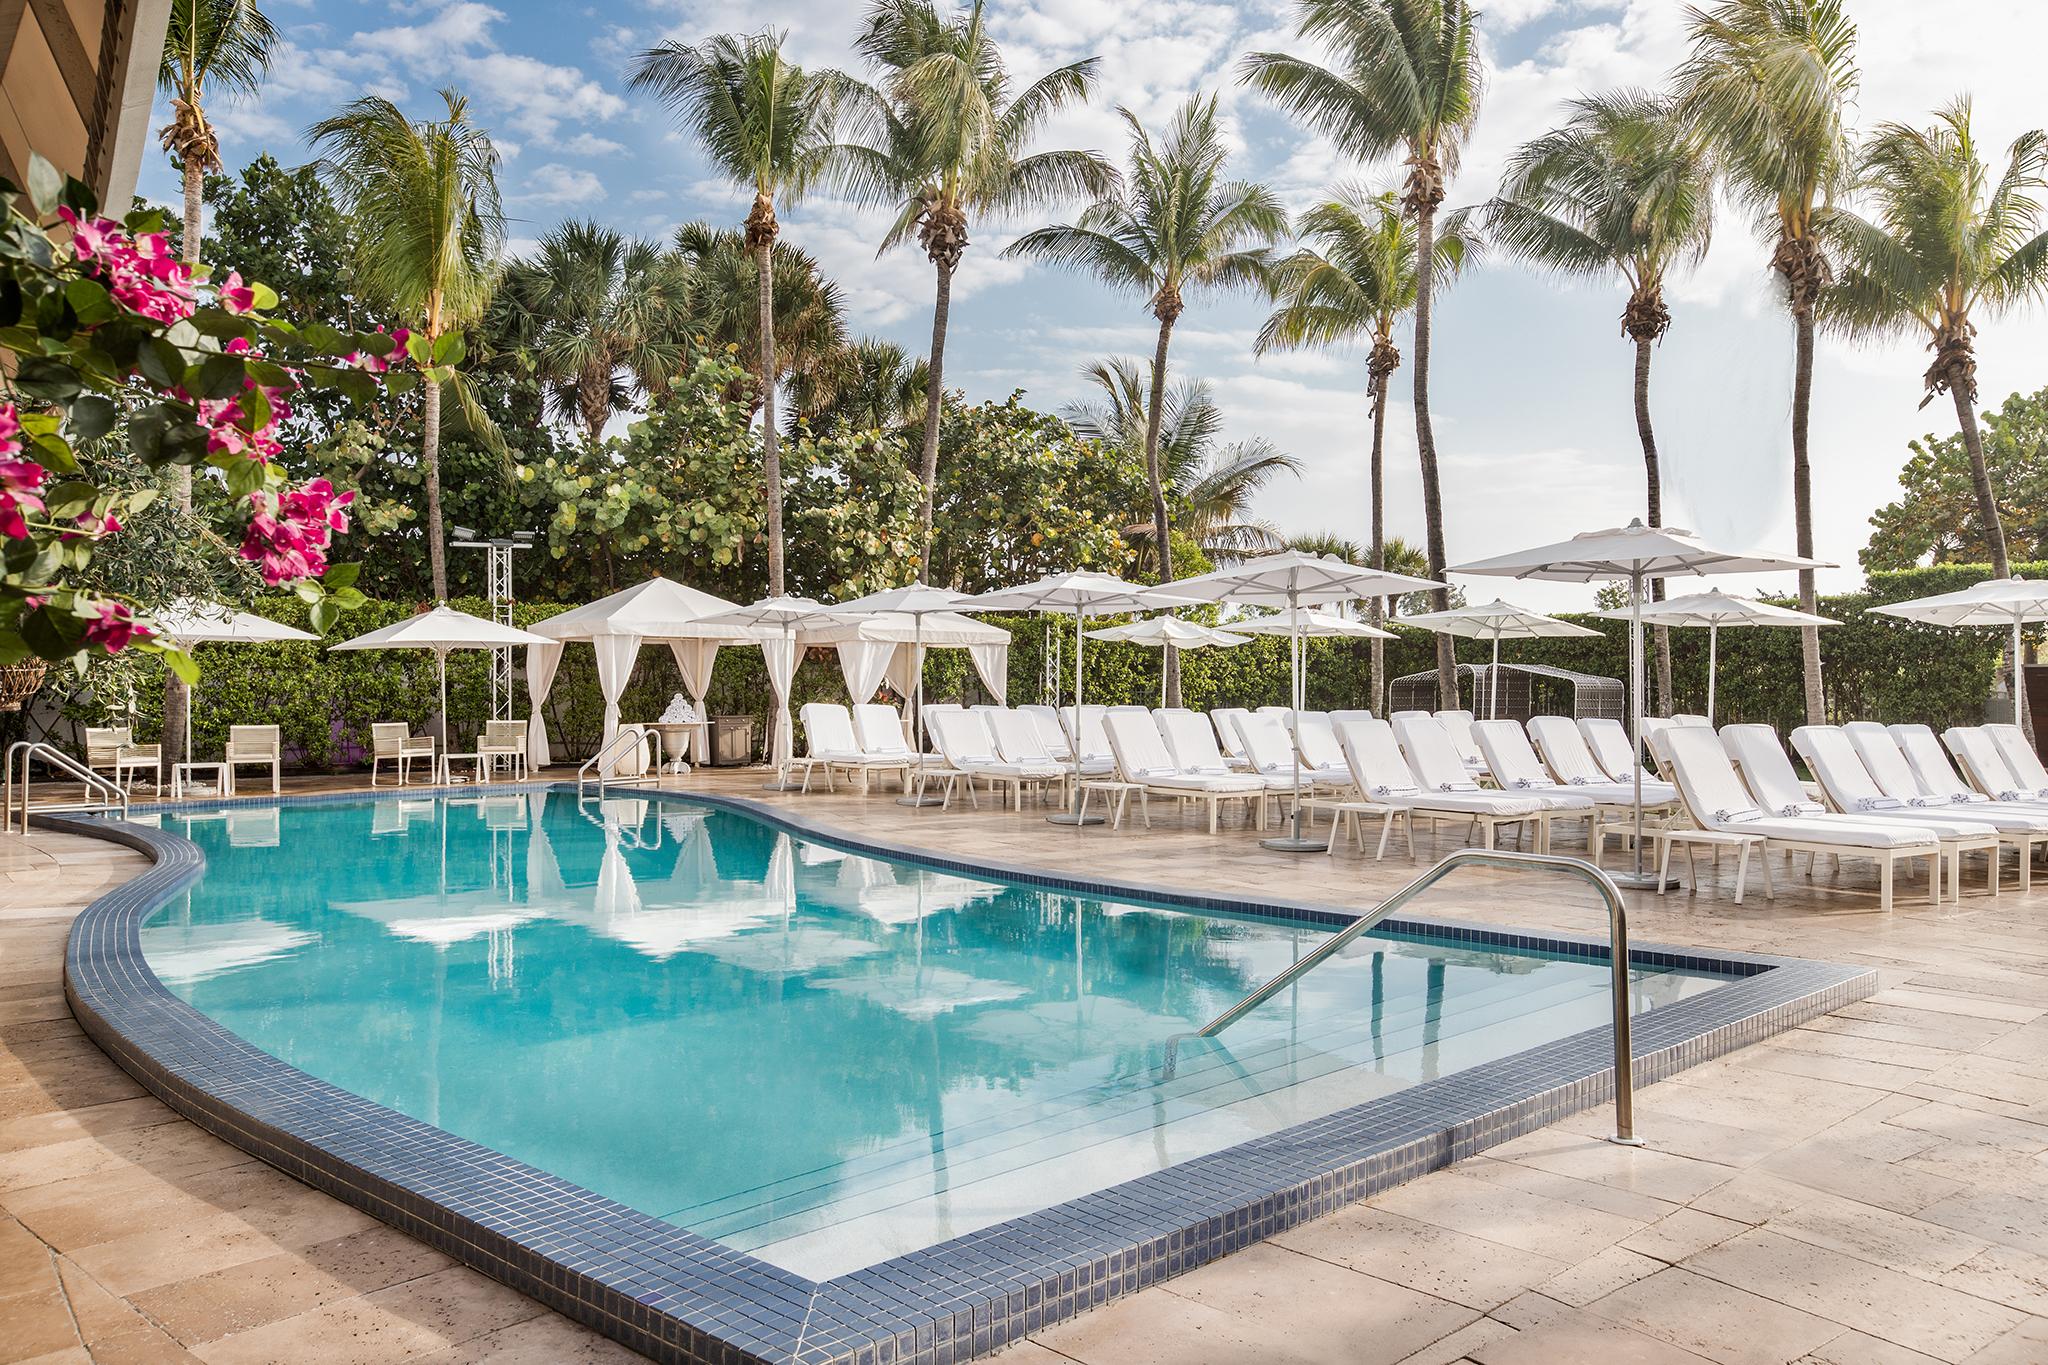 Hilton Bentley Miami South Beach Hotel Room 8